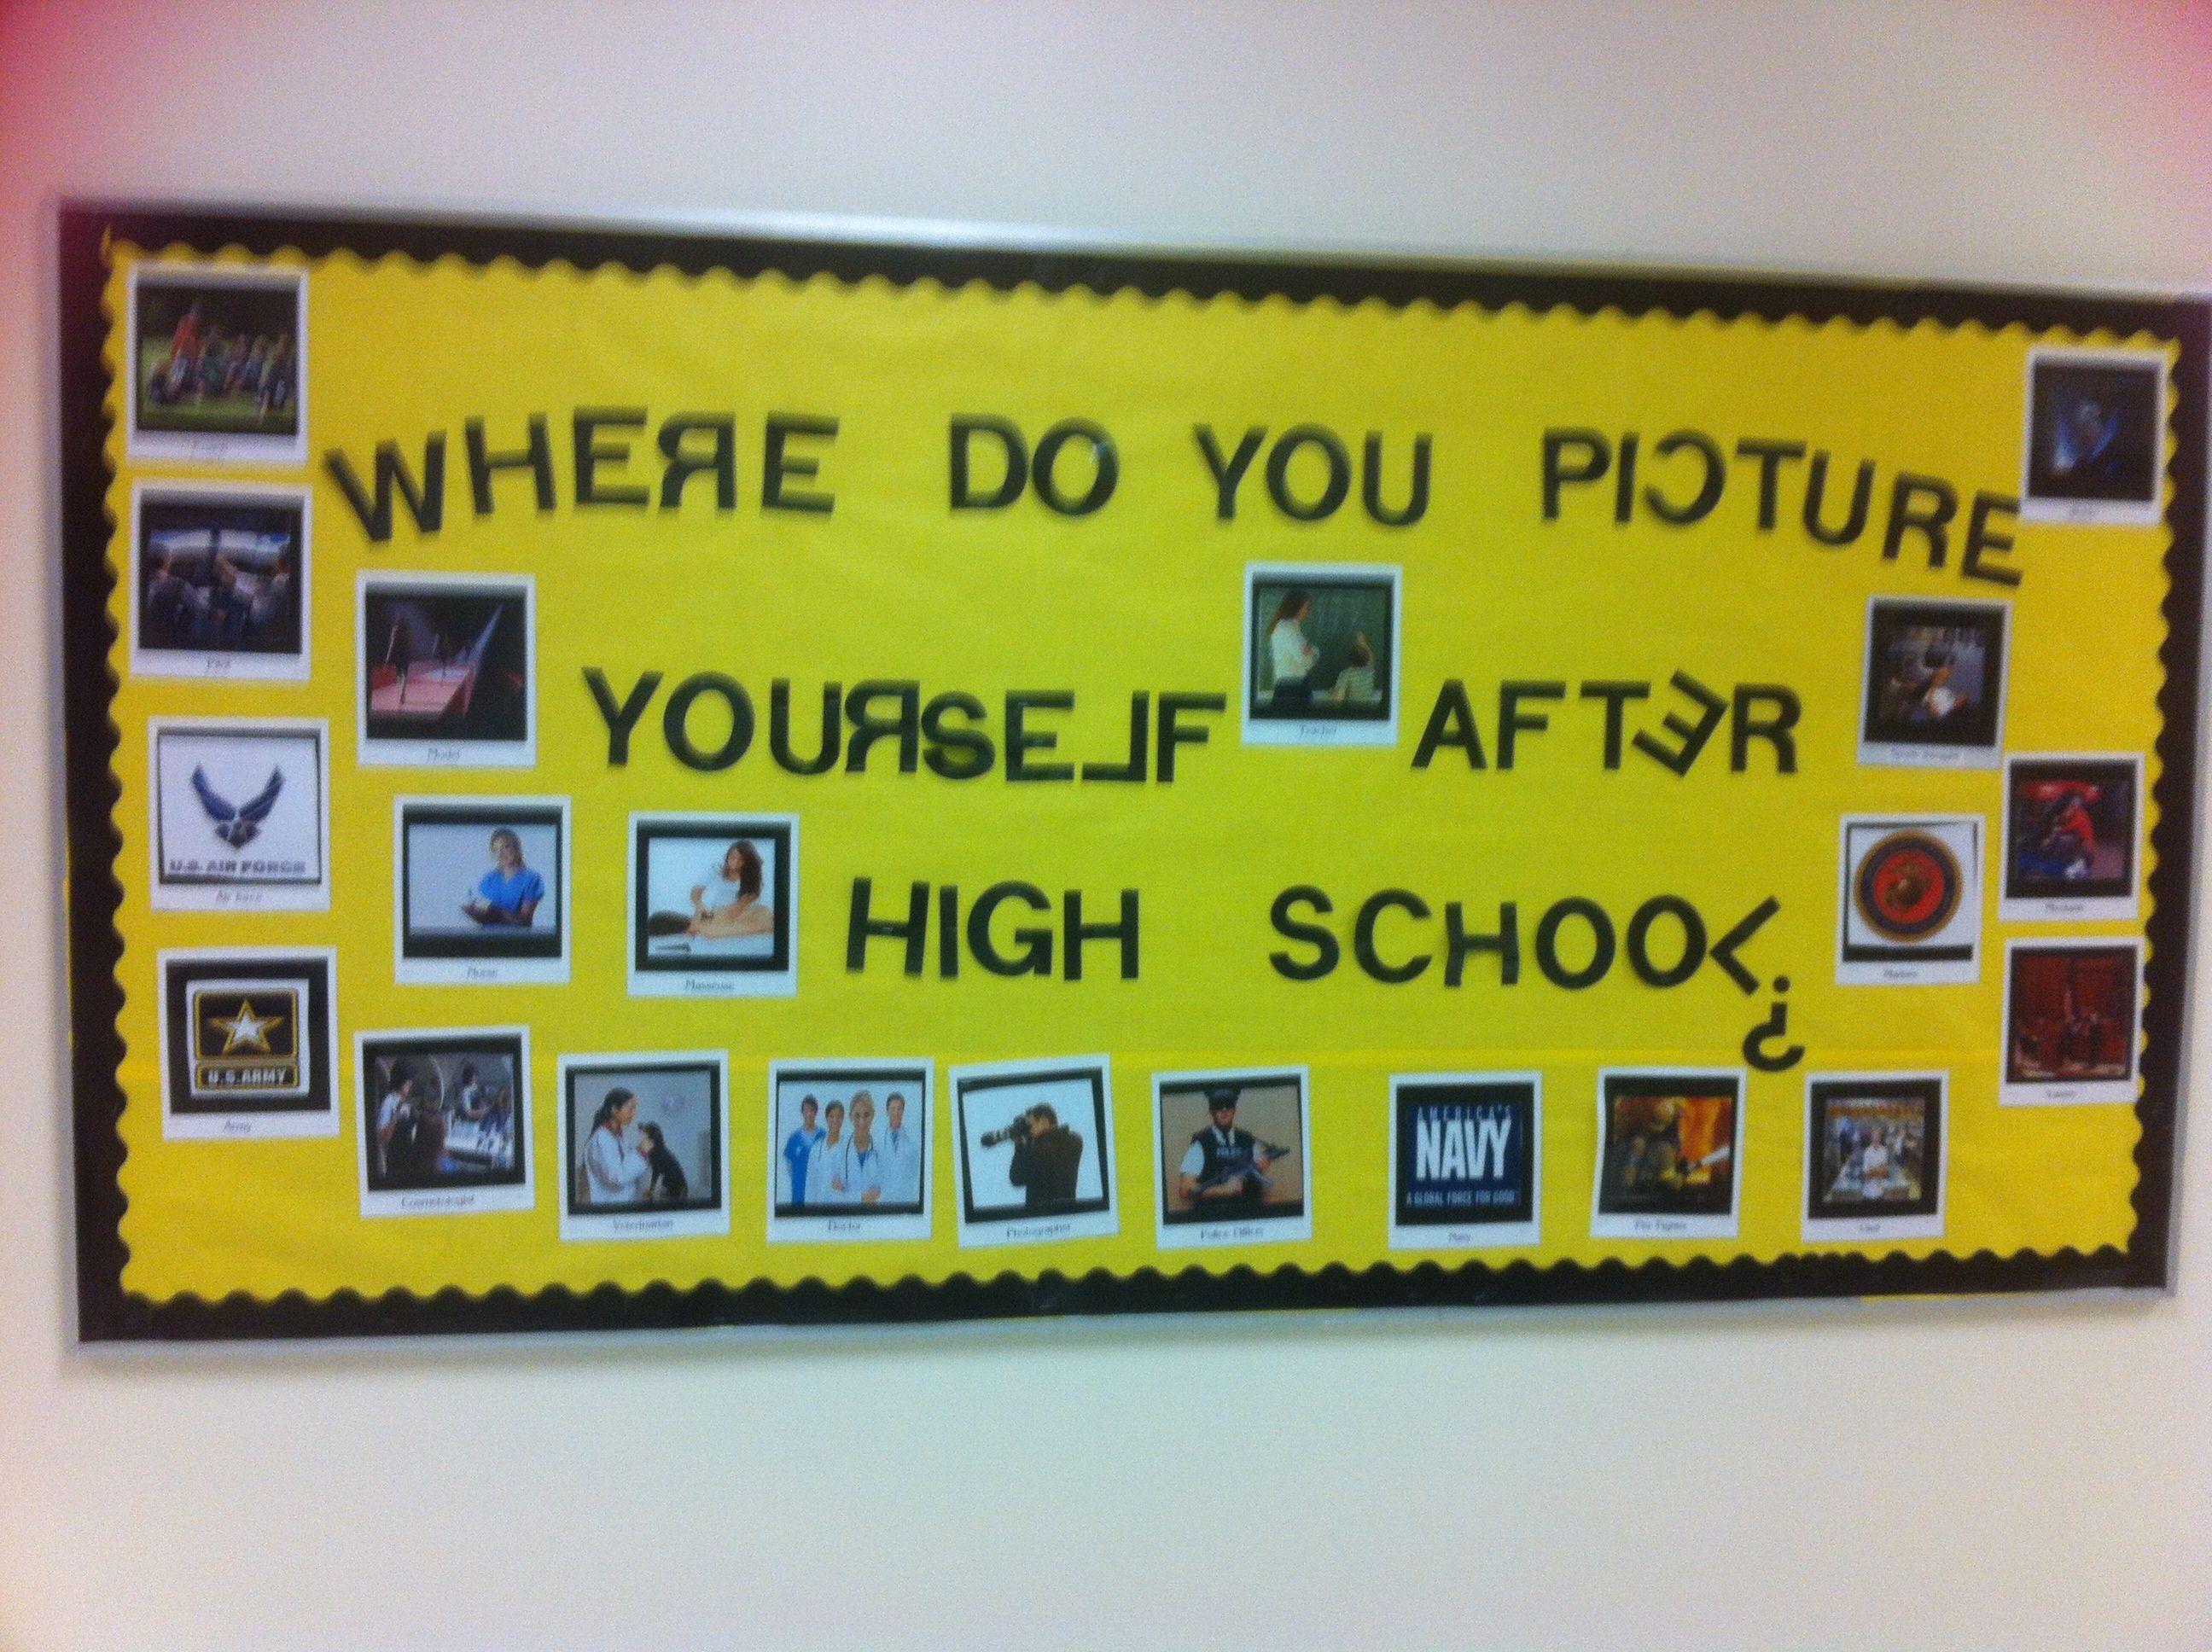 High school career bulletin board designed by high school